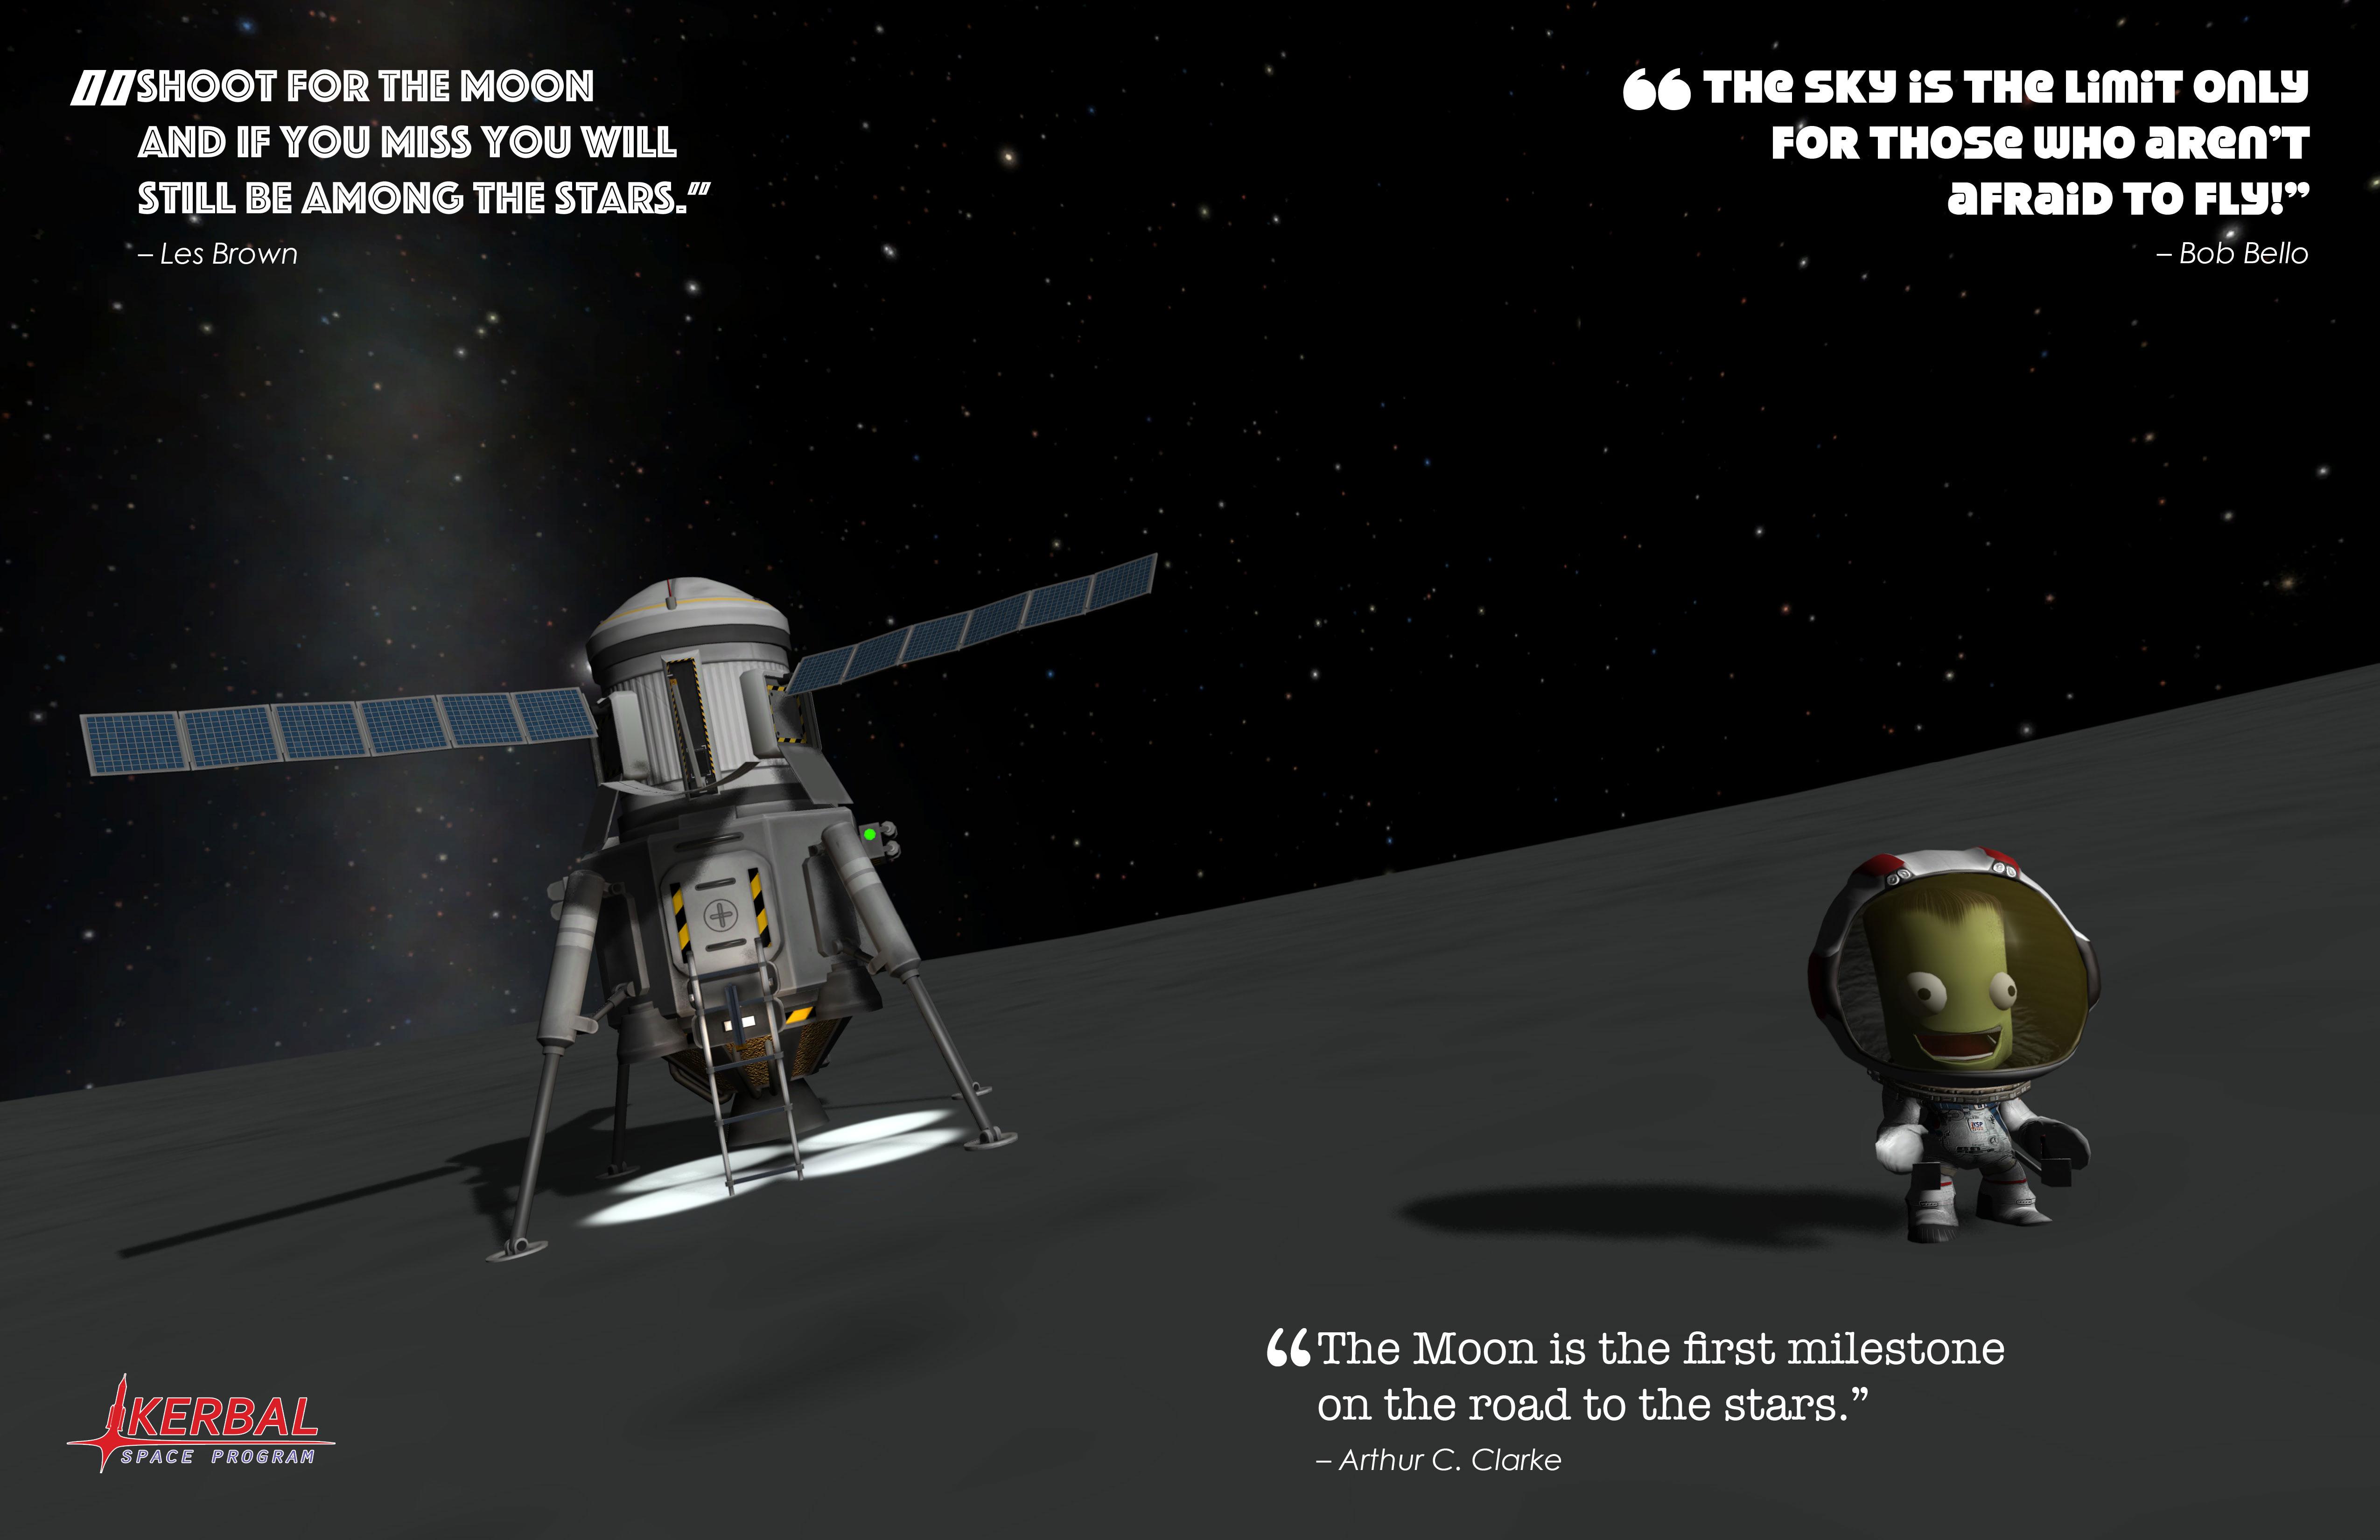 KERBAL SPACE PROGRAM MUN (Moon) POSTER. Credit: Squad, Monkey Squad S.A de C.V.